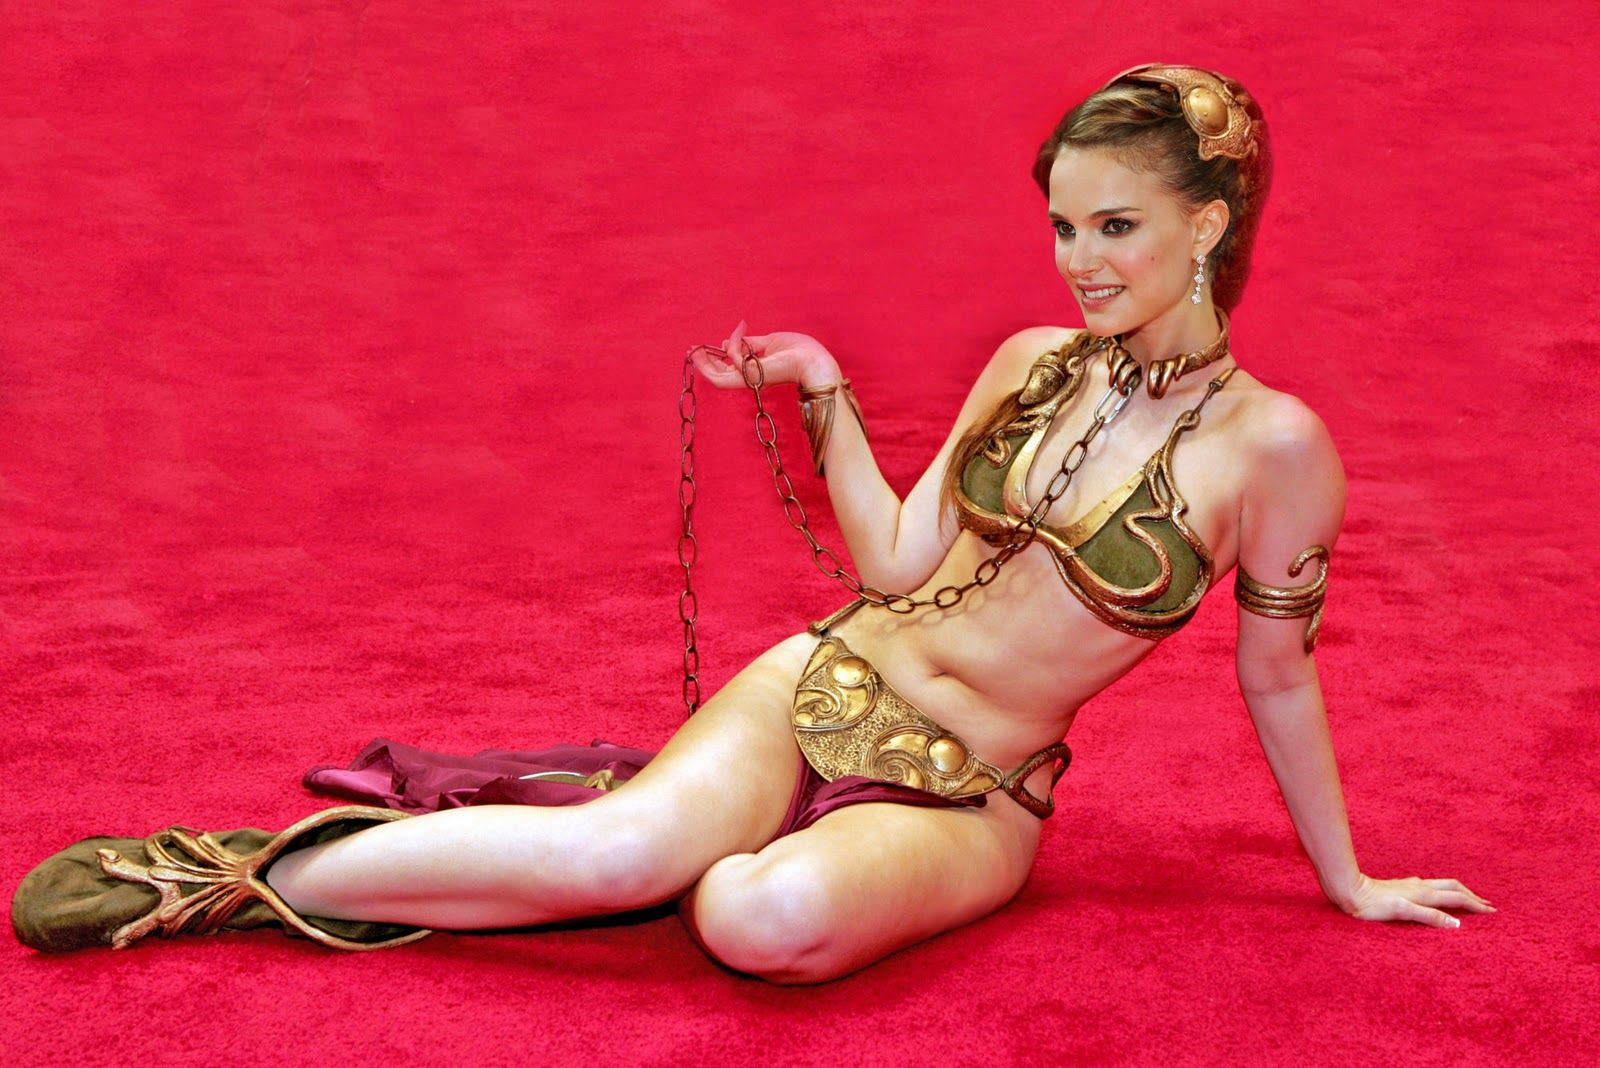 Natalie Portman as Princess Leia | Beautiful Women ...